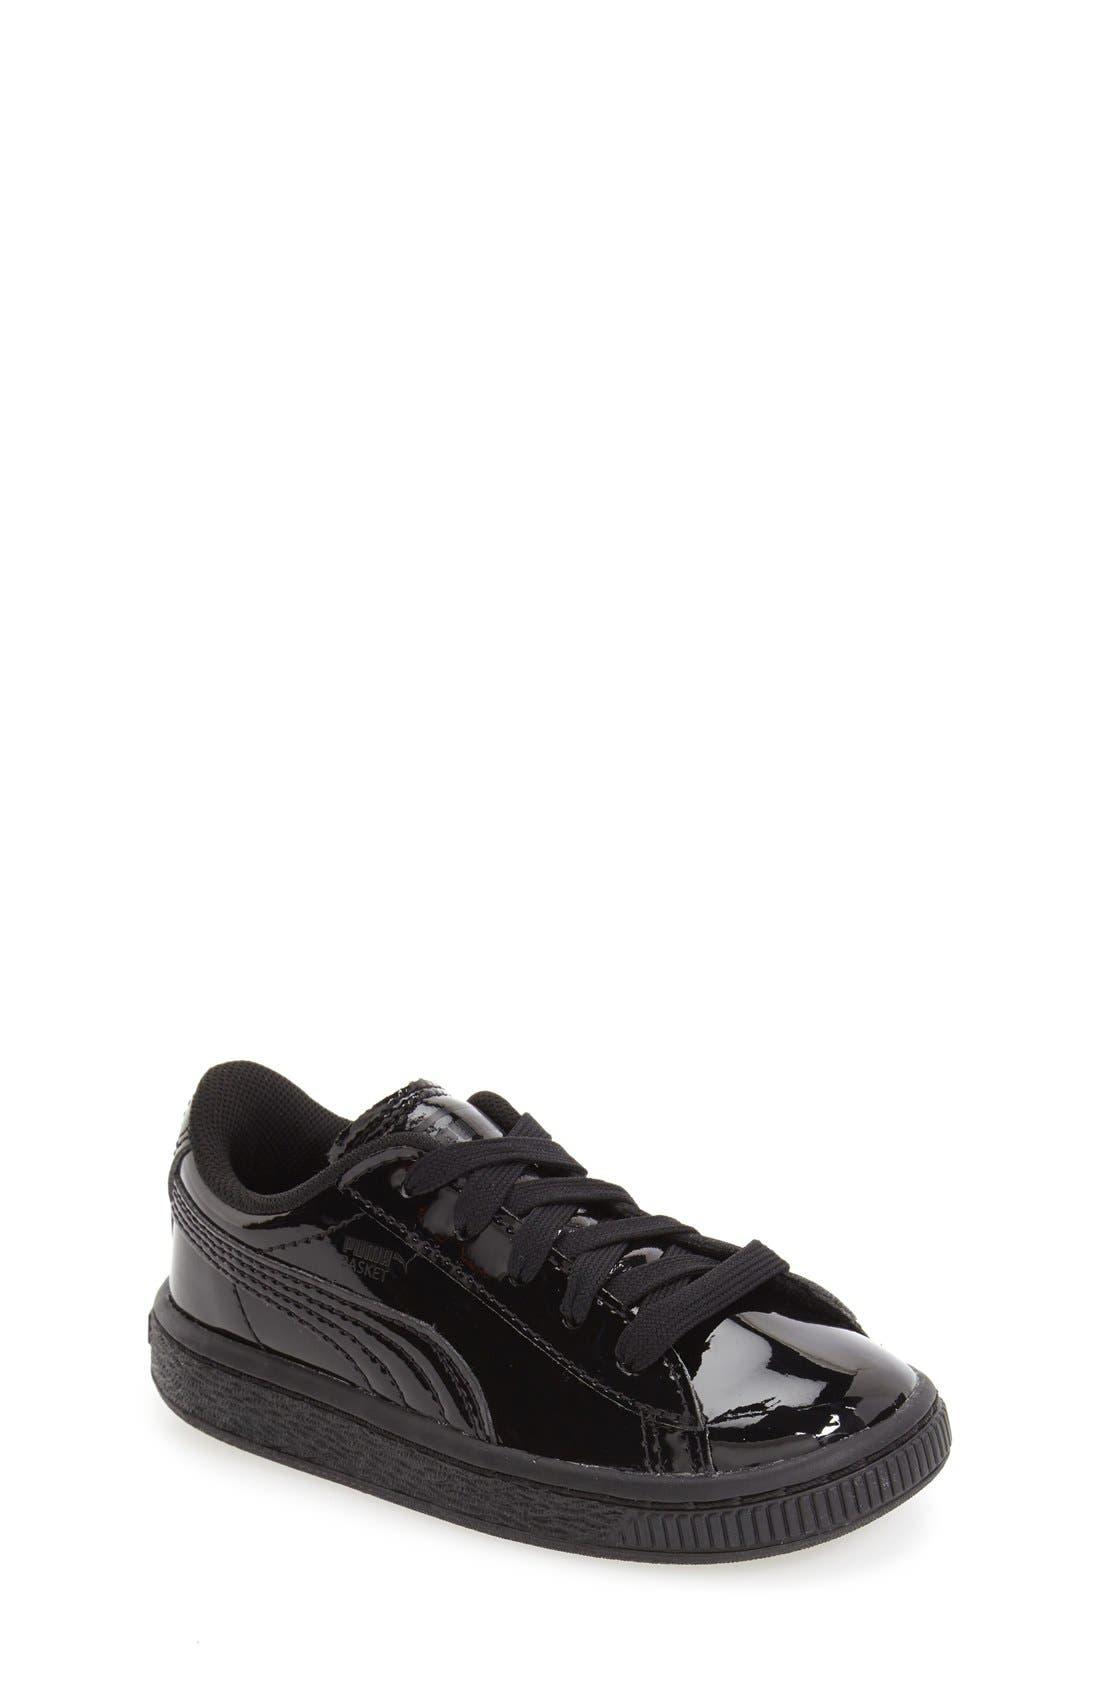 Alternate Image 1 Selected - PUMA 'Basket Classic' Shoe (Baby, Walker & Toddler)